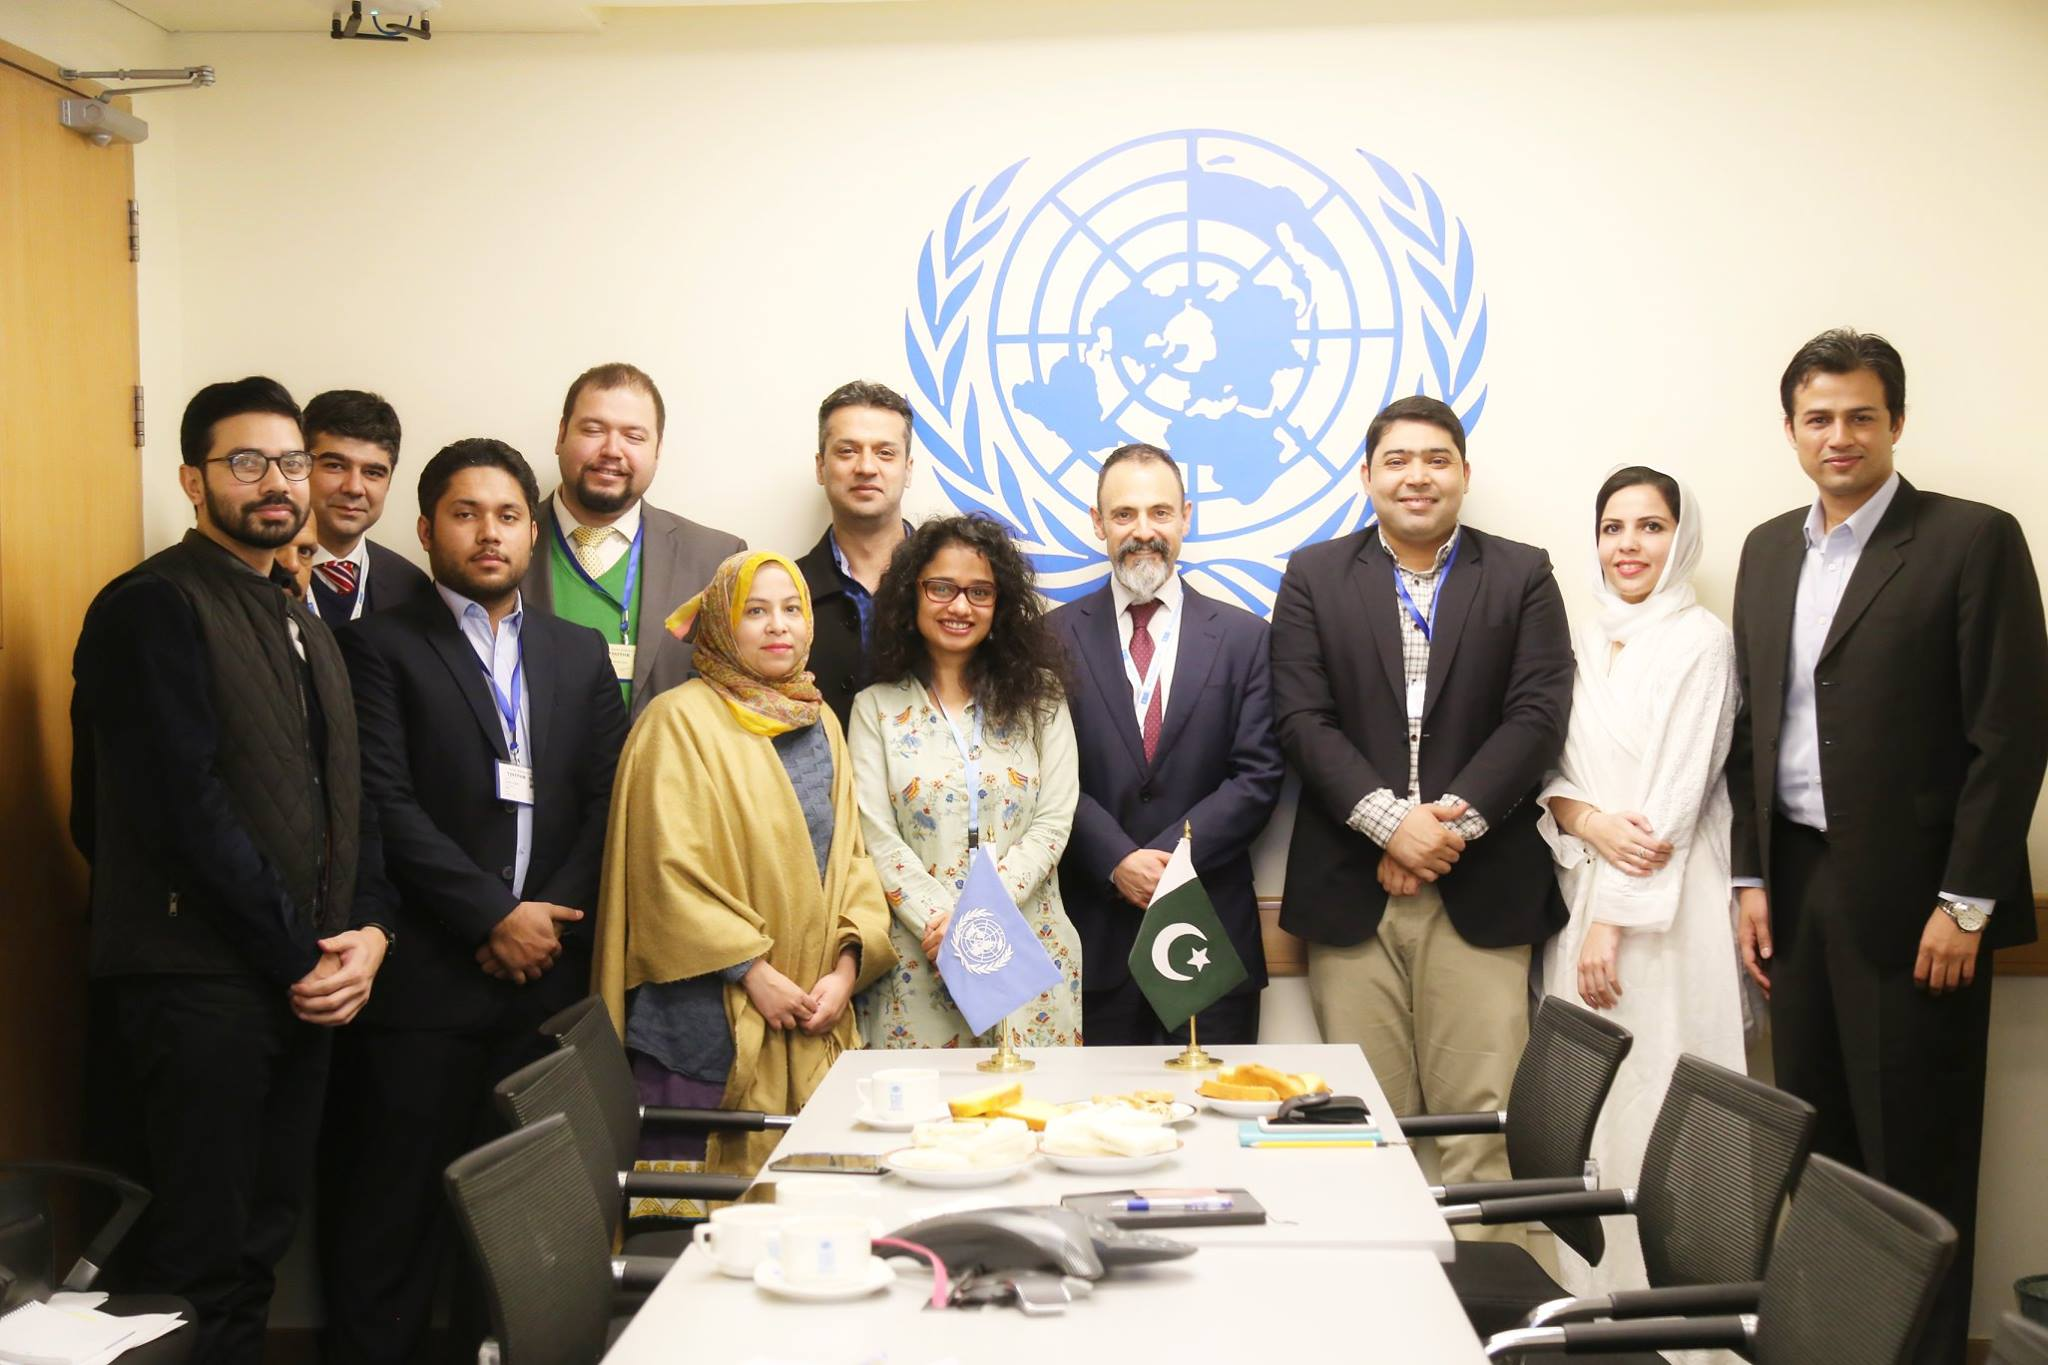 UNDP signed partnership MOU with PJN on SDG 16